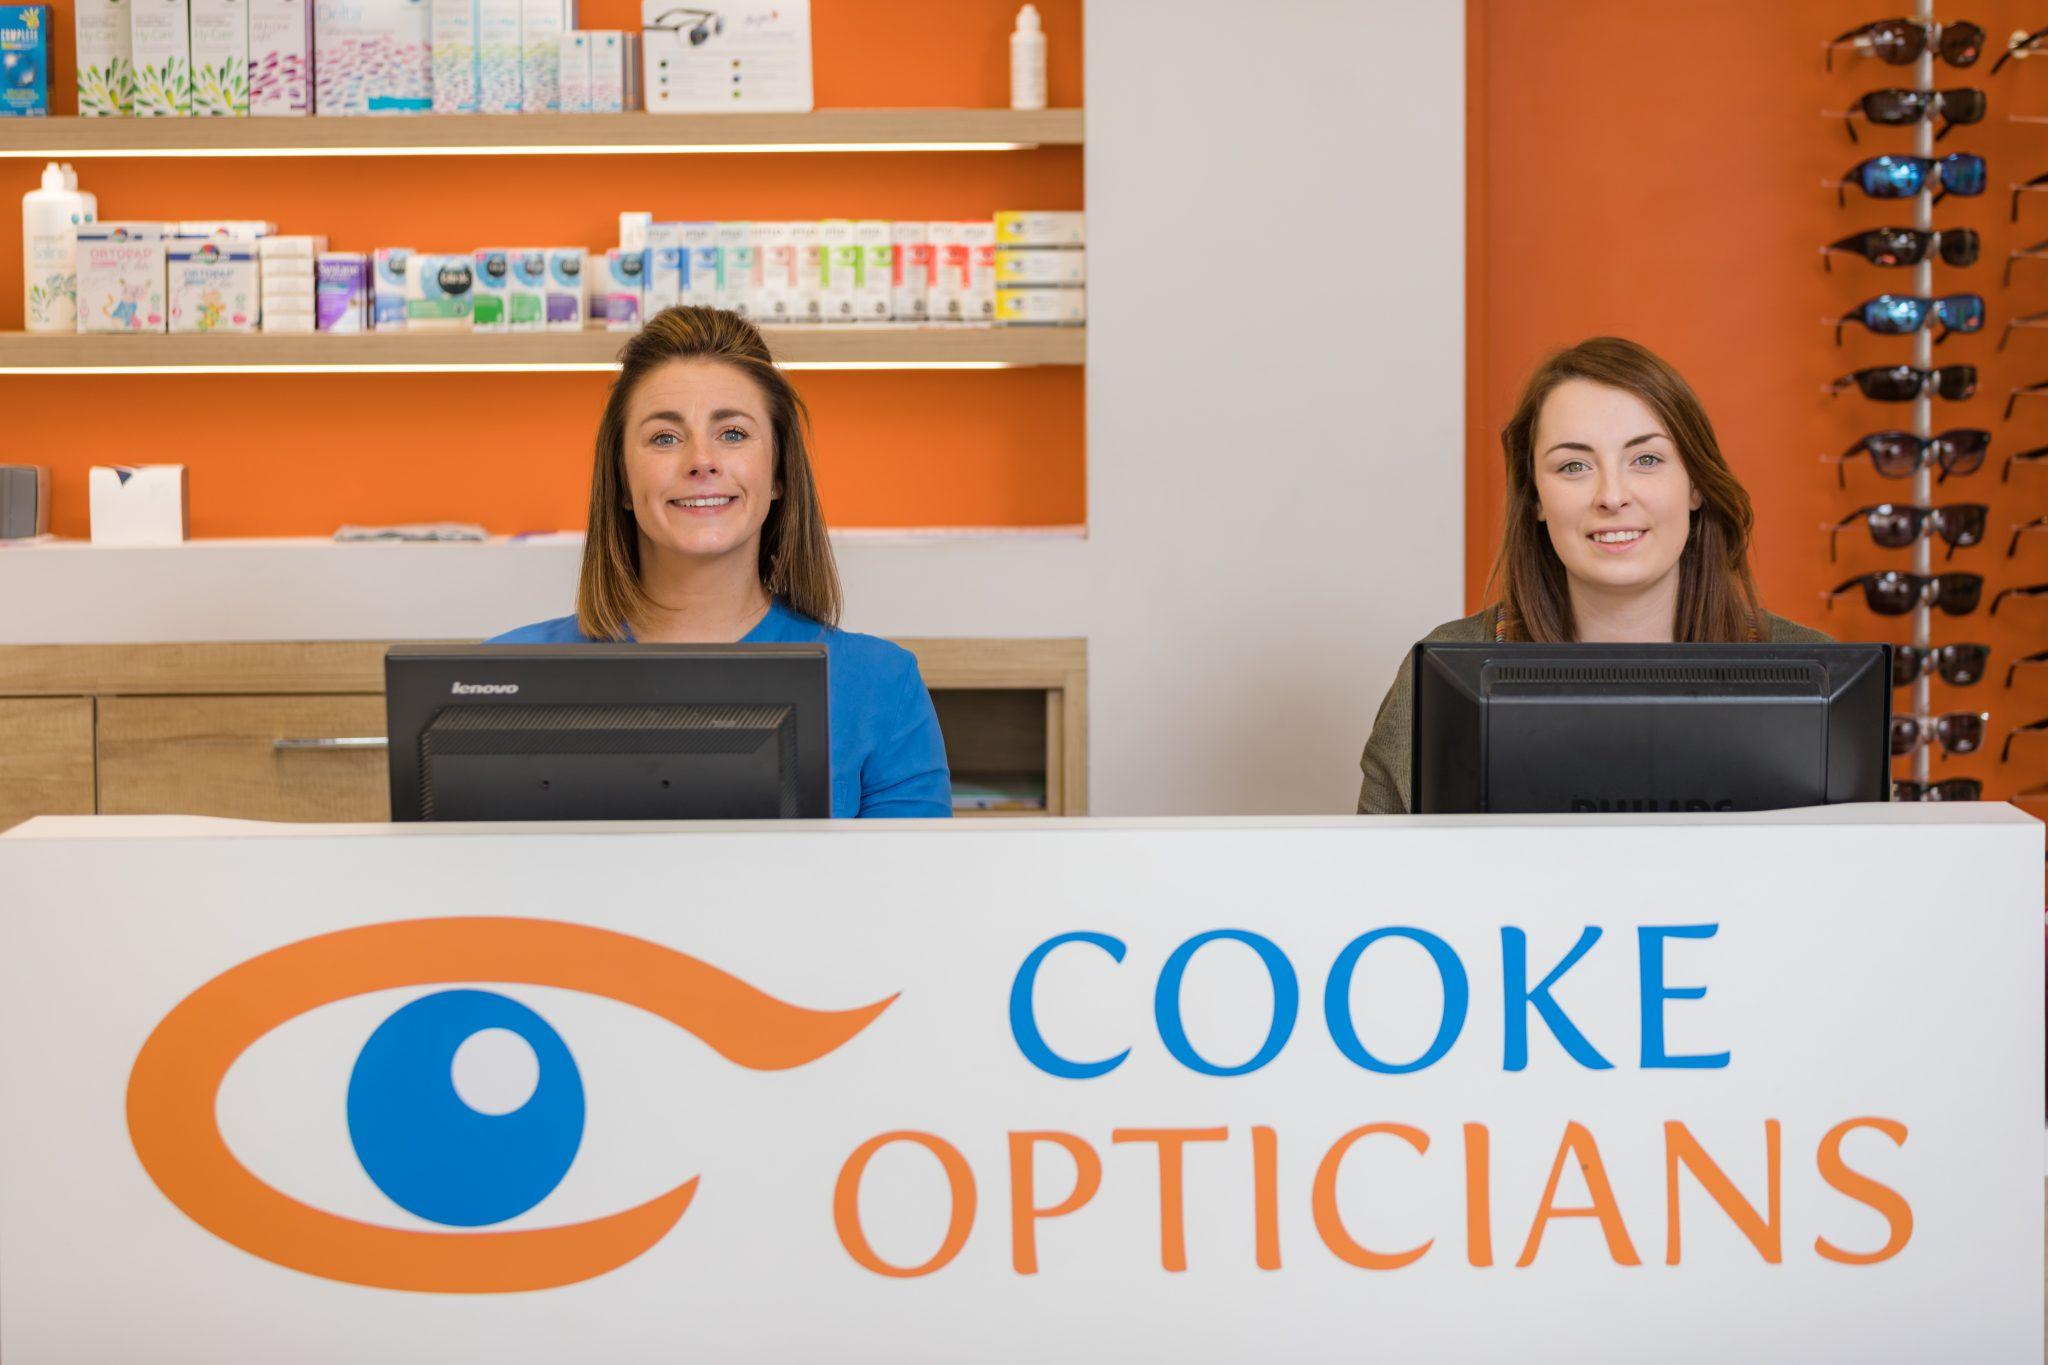 Independent opticians, Stephen Street, Sligo